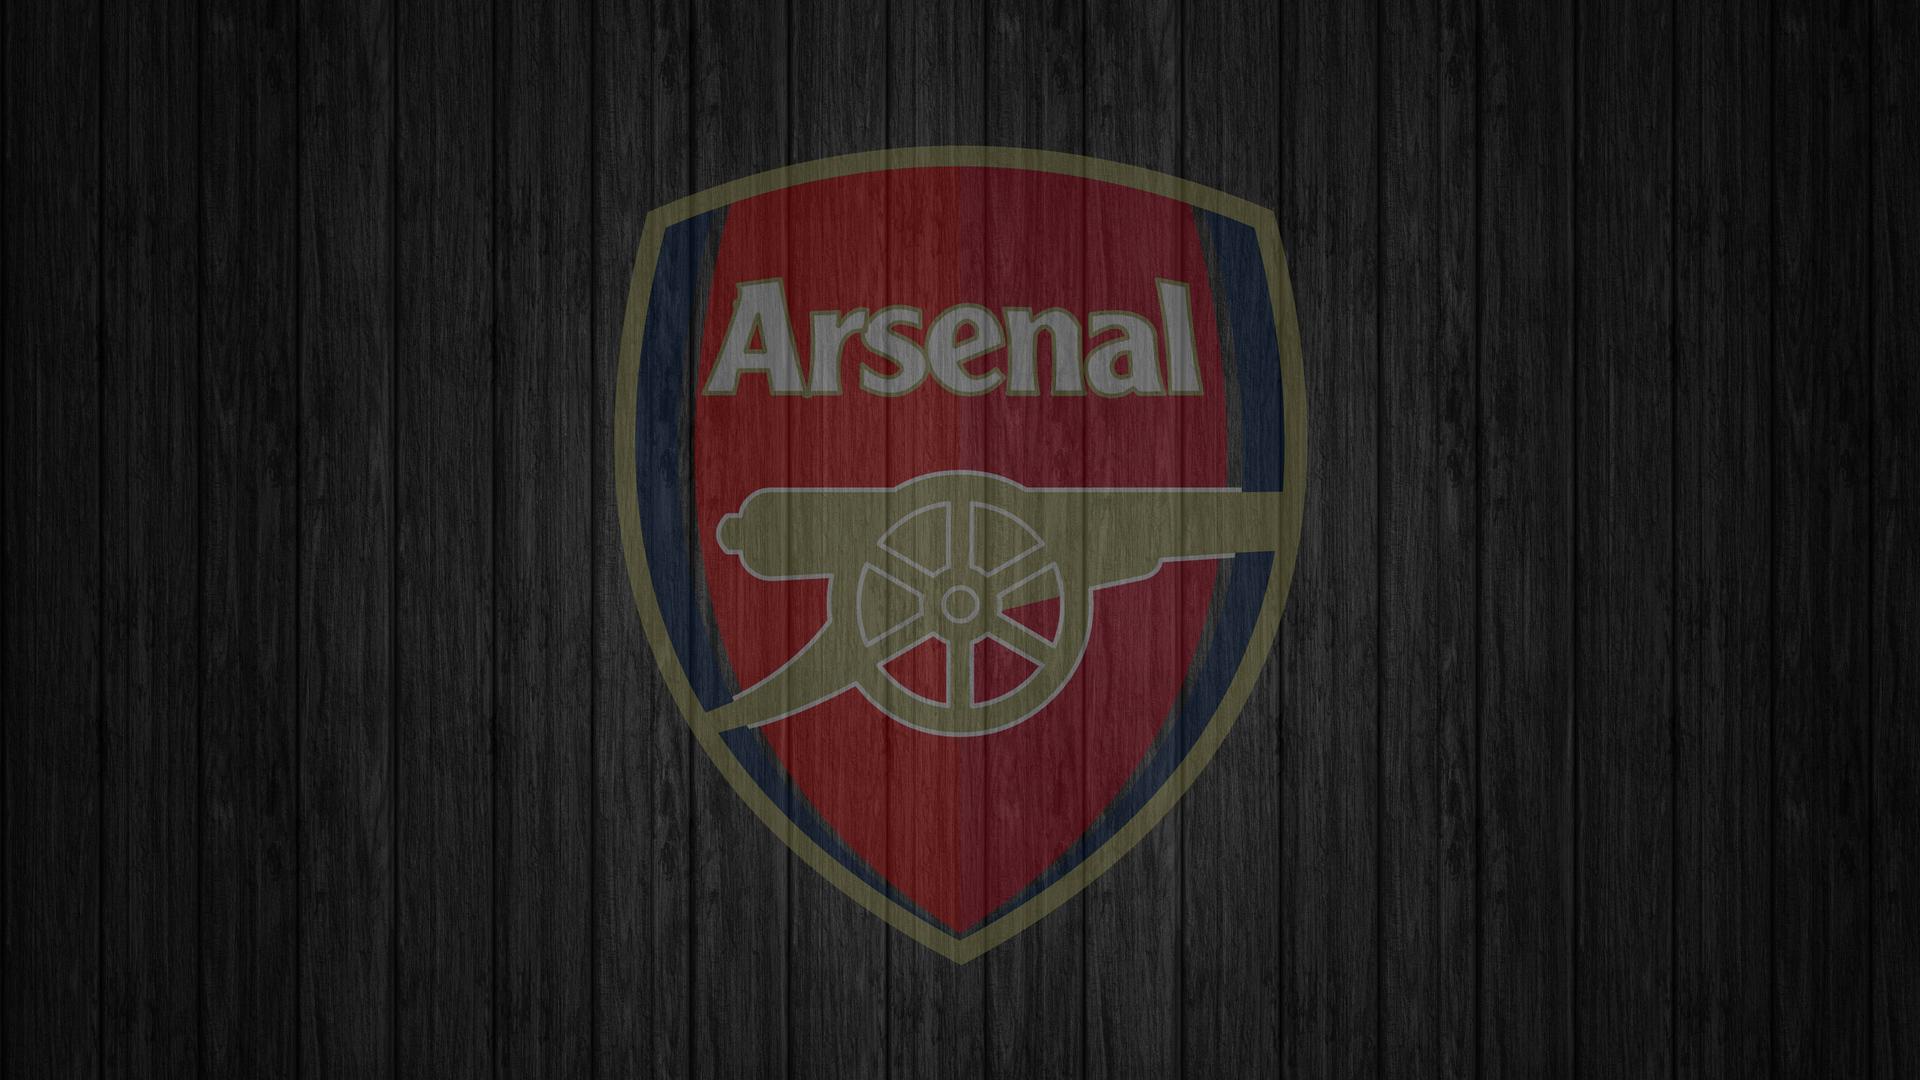 1920x1080 Arsenal Logo Laptop Full Hd 1080p Hd 4k Wallpapers Images